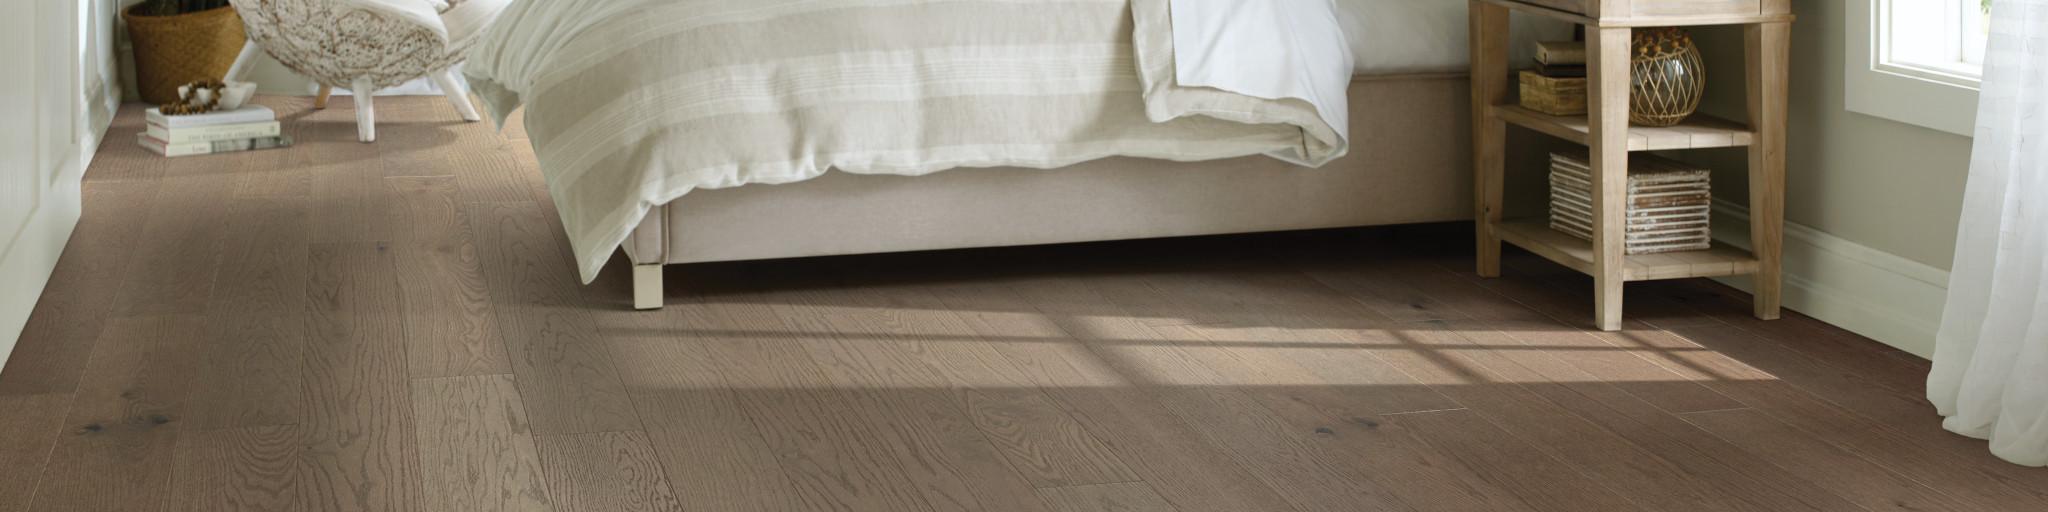 Hardwood-Epic-Plus-Exploration-Oak-sw713-07075-Bedroom-2020